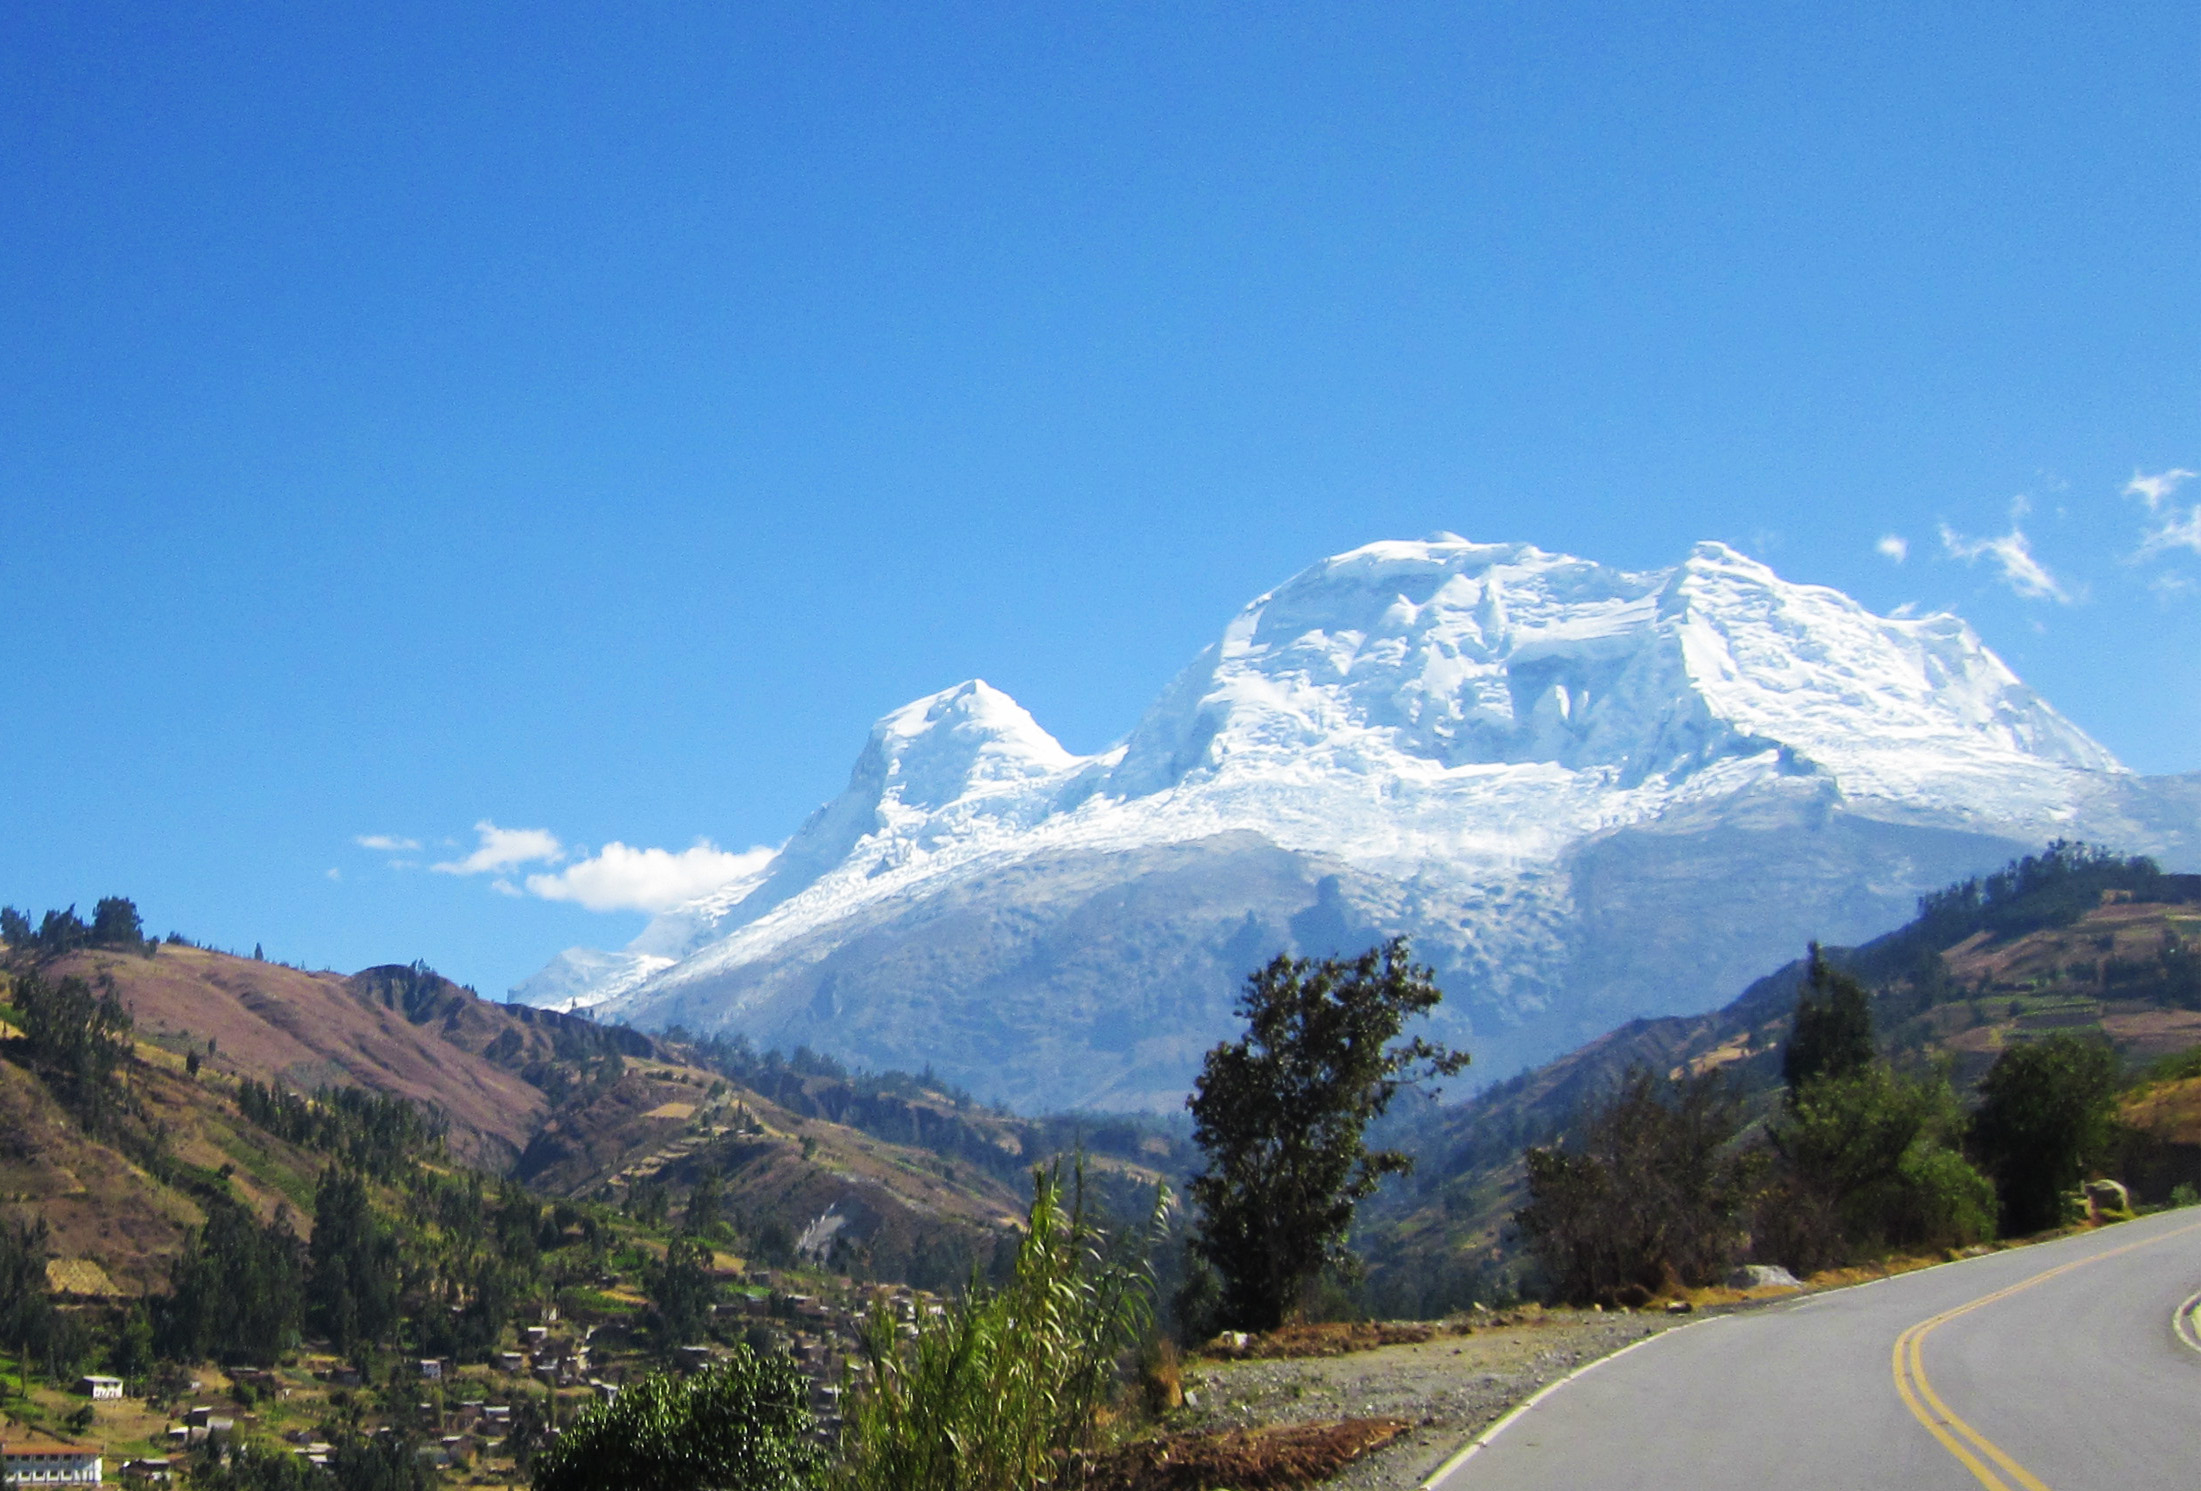 Parque Nacional Huascarán Wikipedia La Enciclopedia Libre